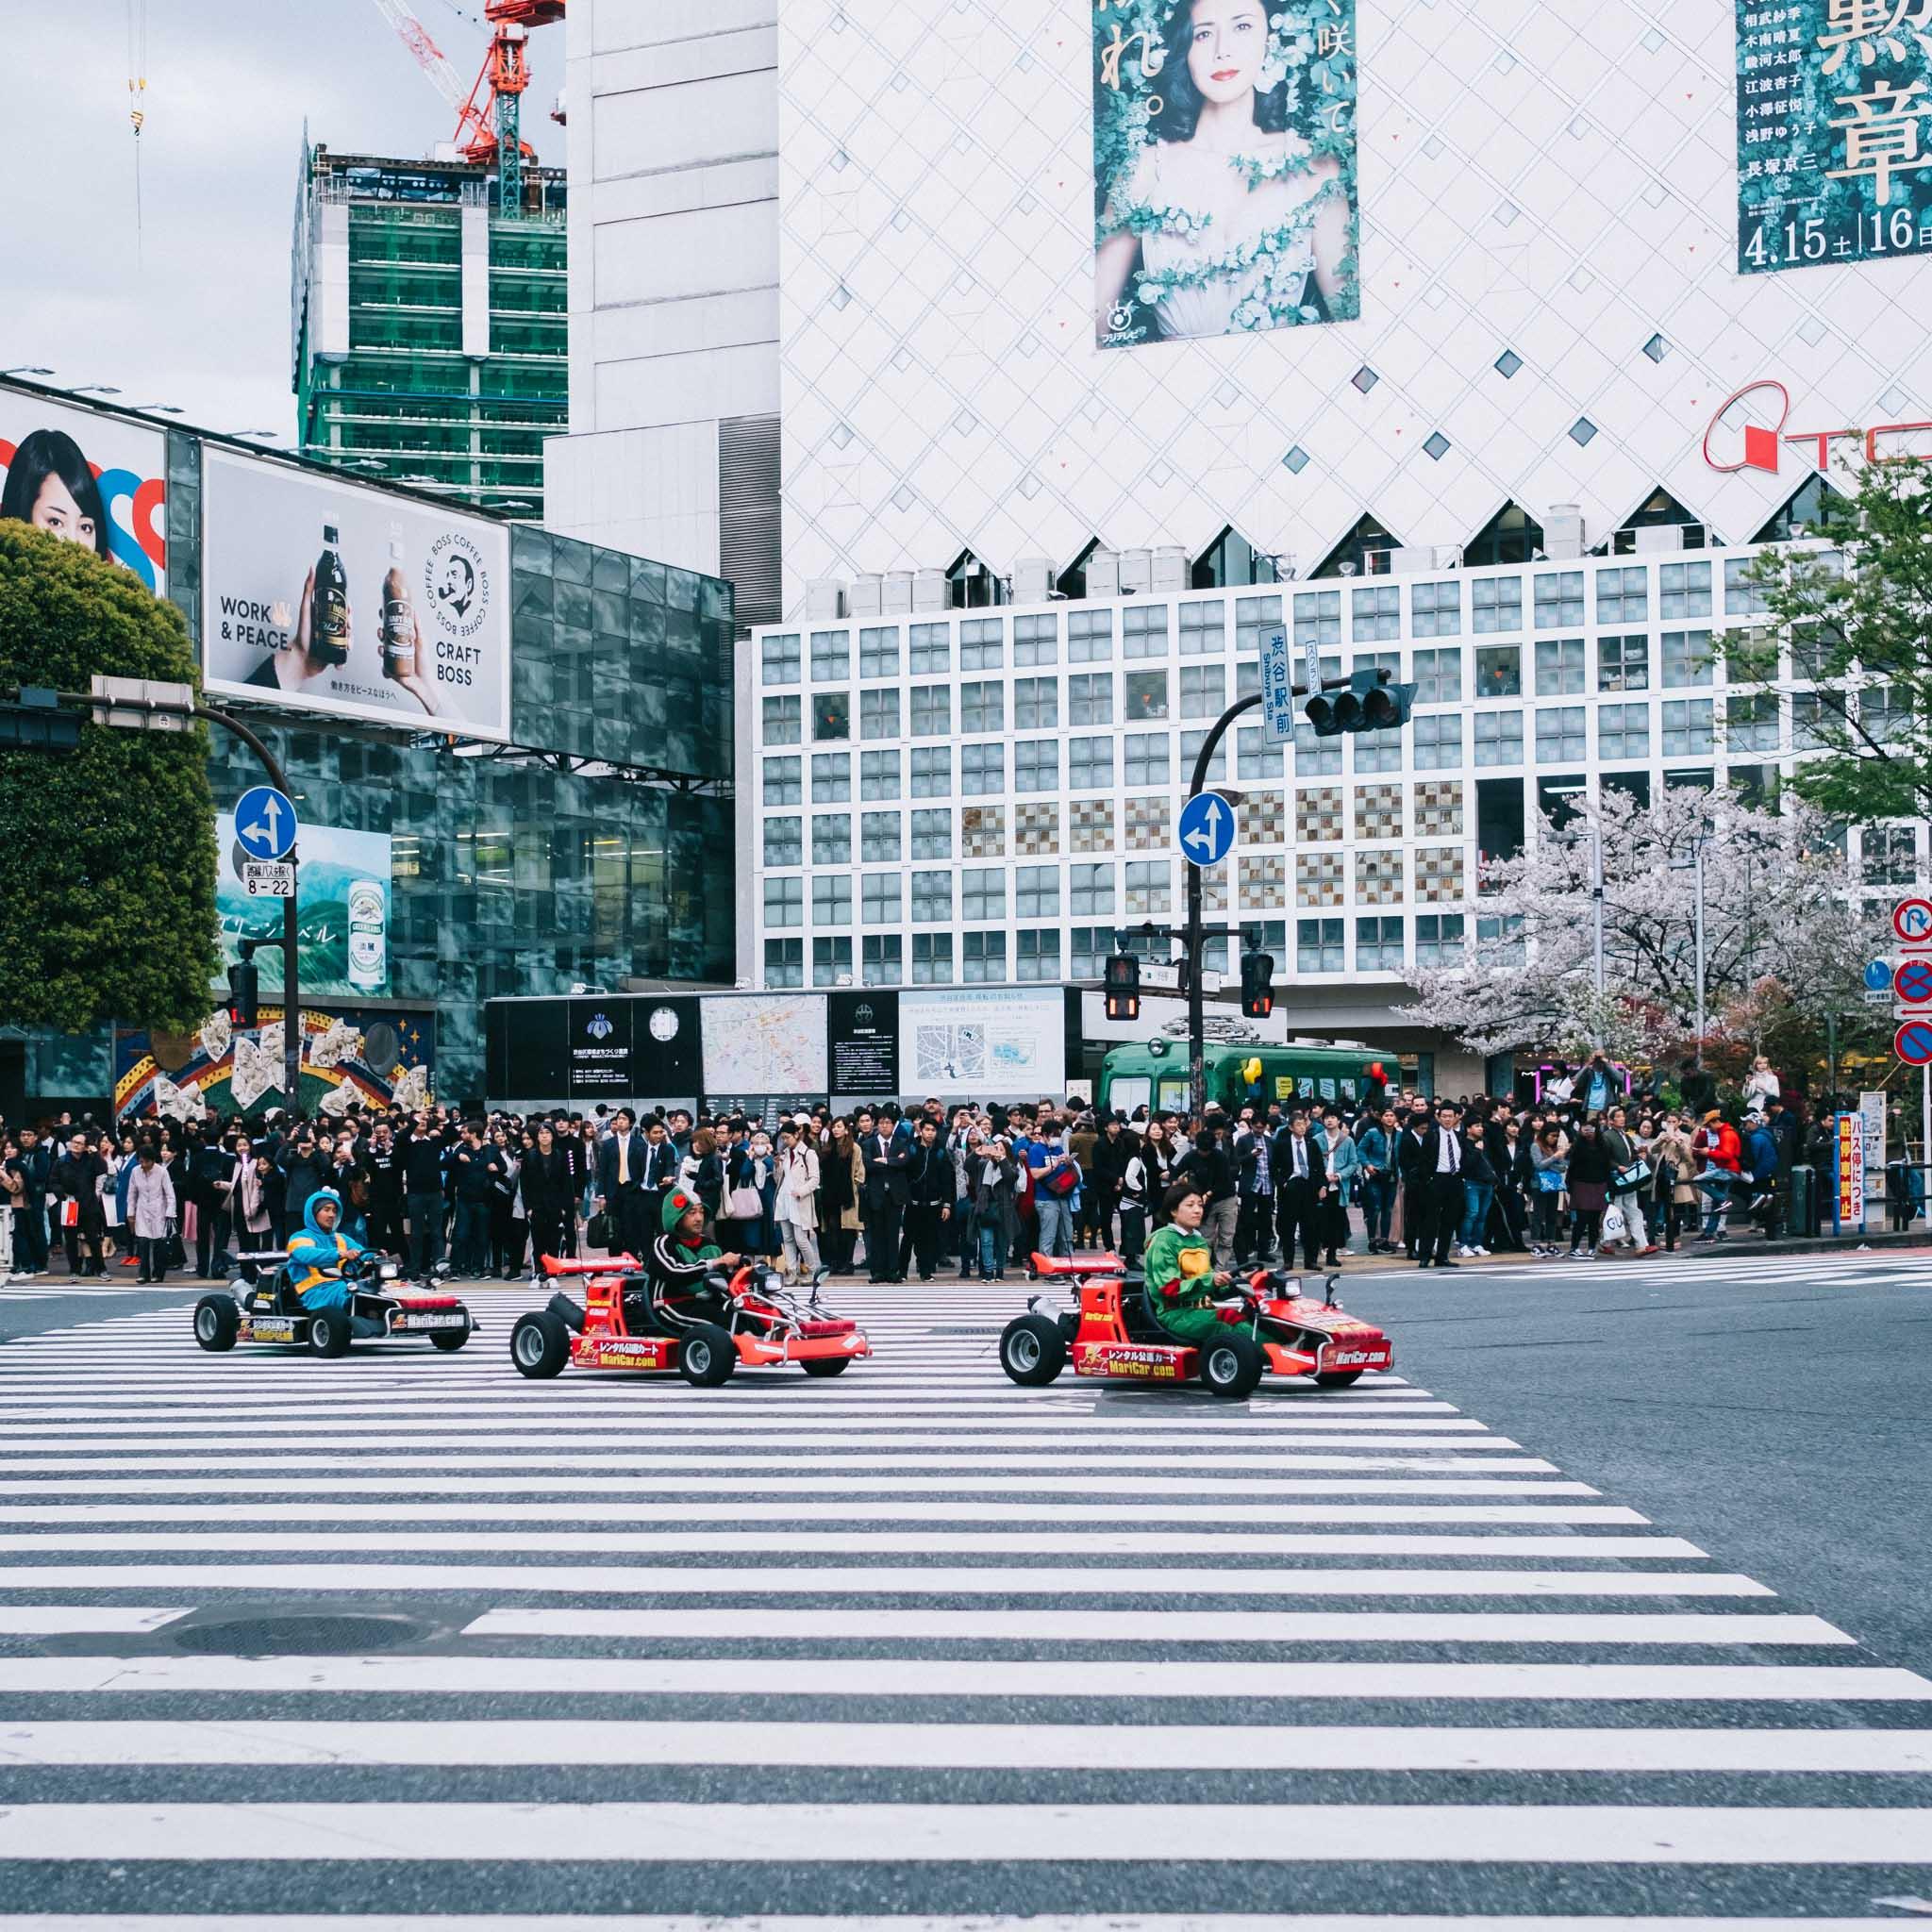 chris_eberhardt_japan_travel_reise_nippon-61.jpg